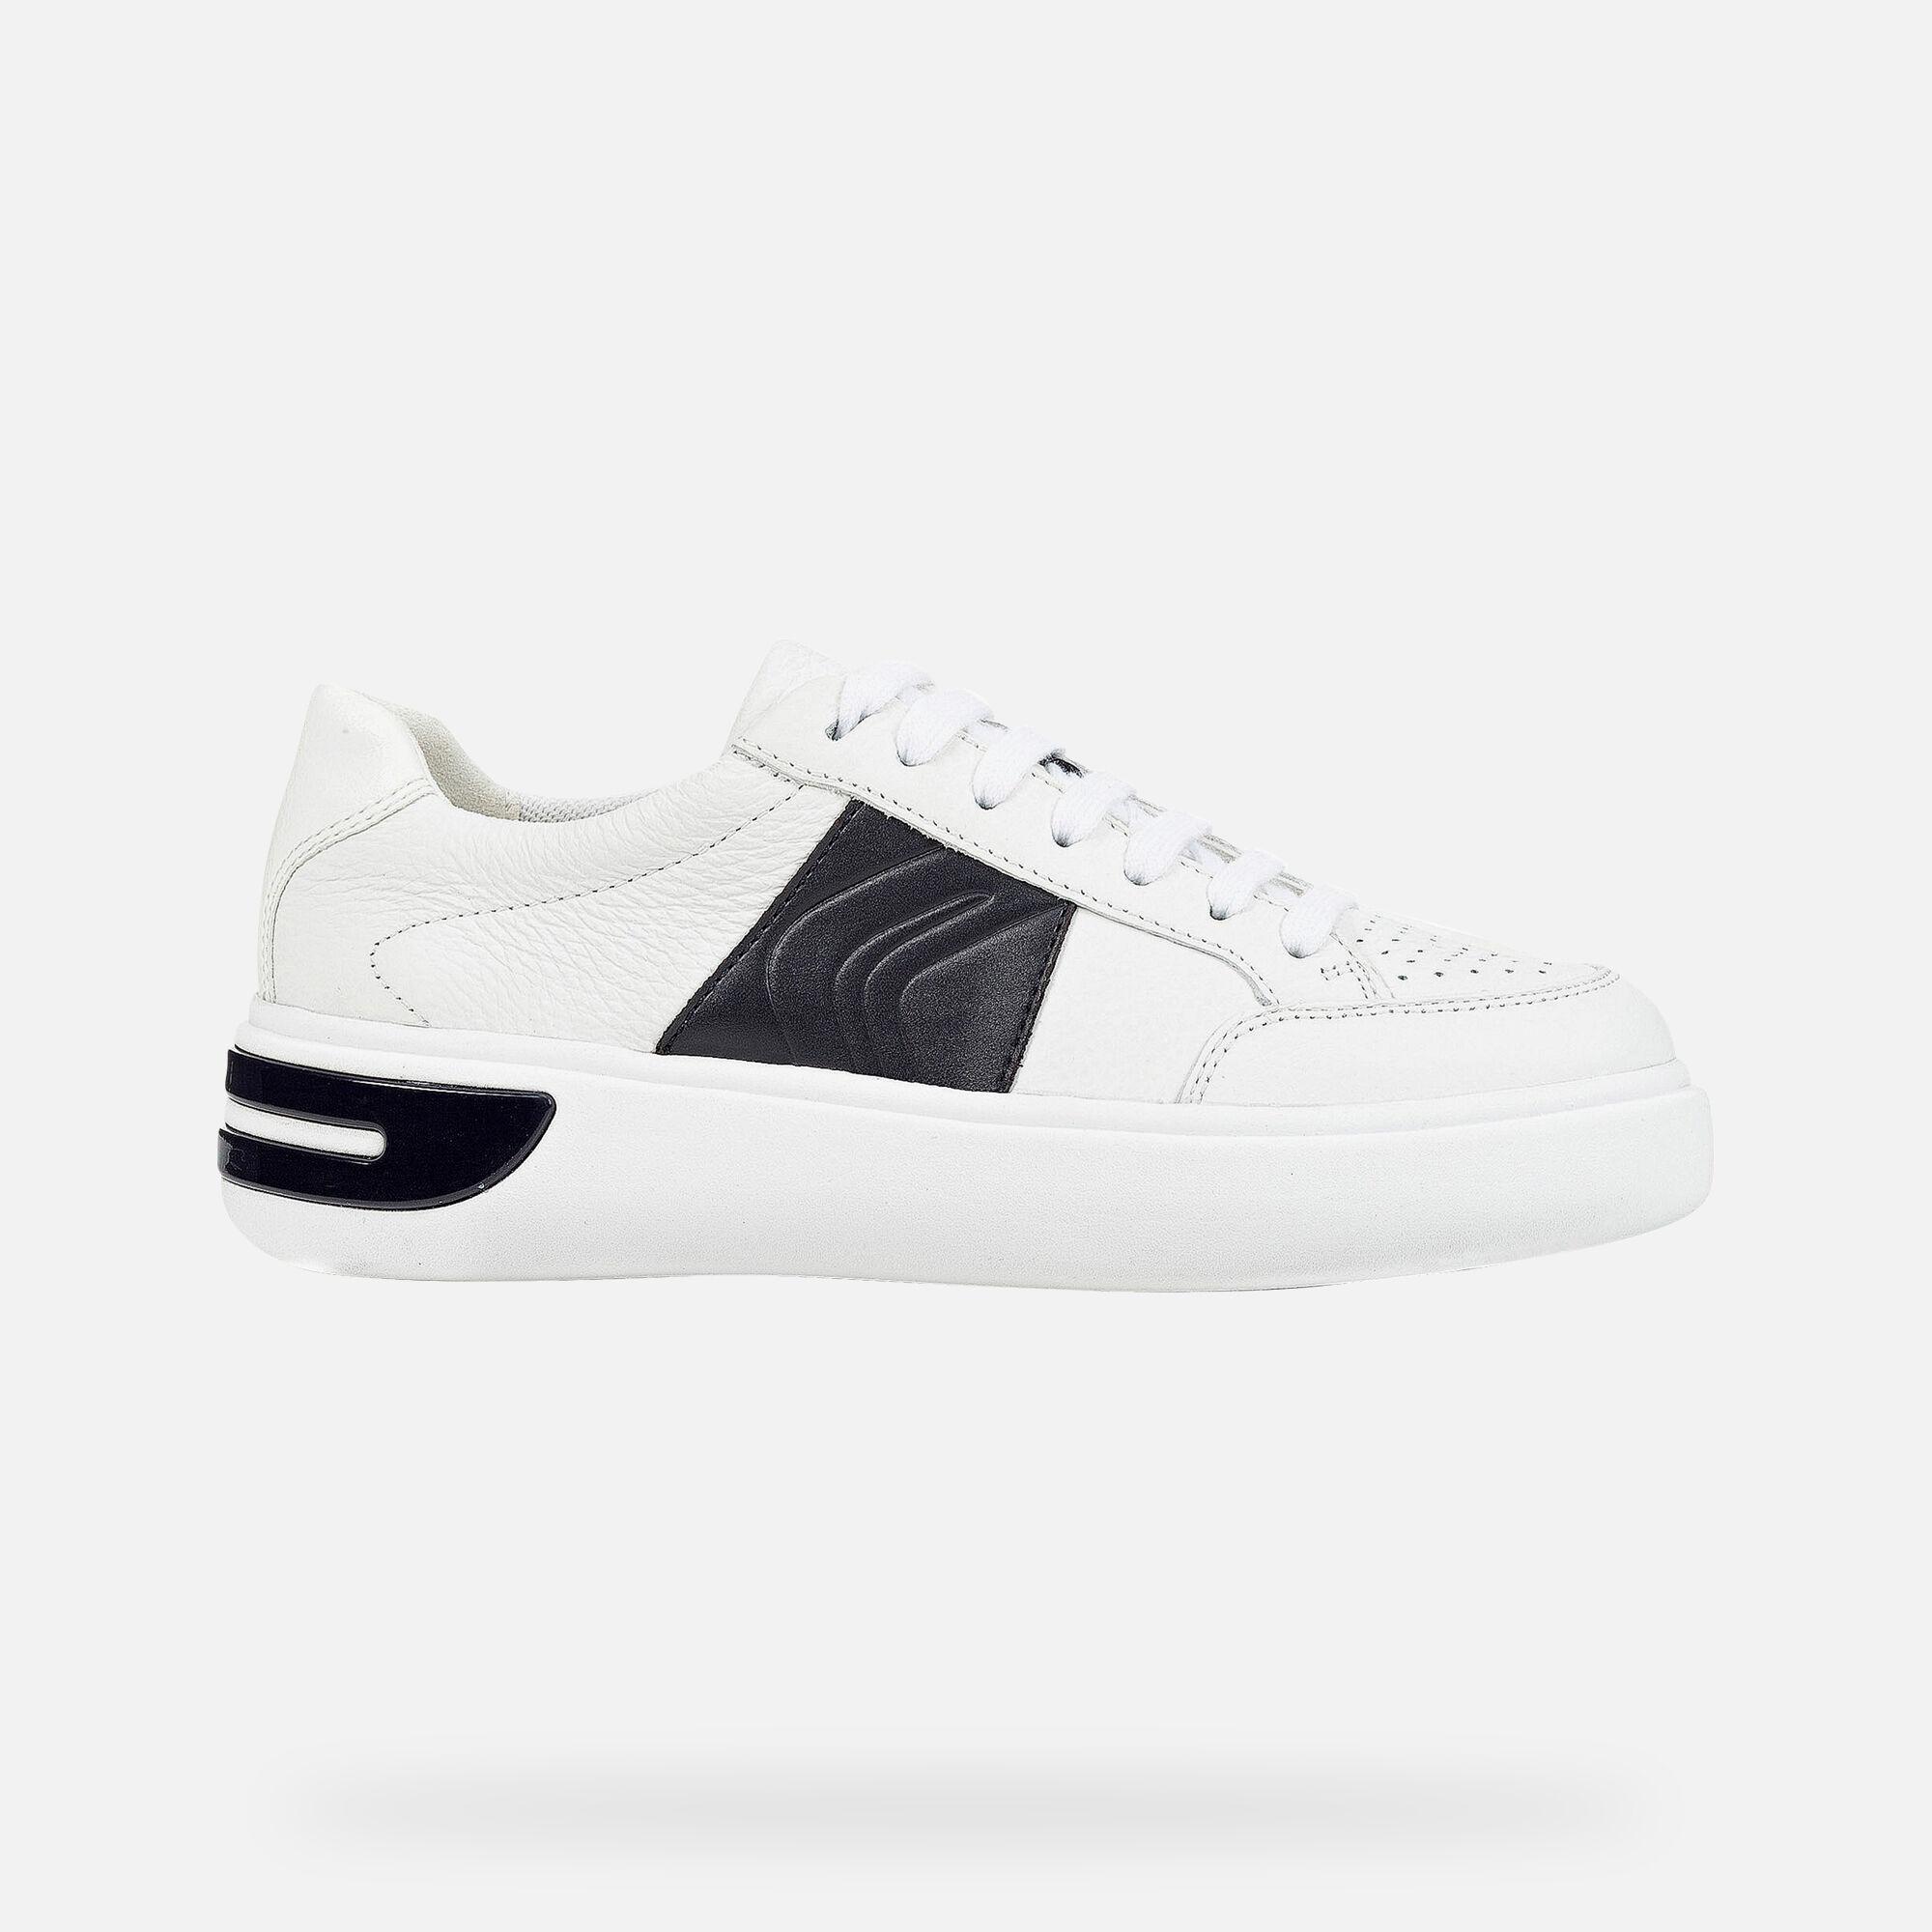 Shi Chung Bass Sensomo WomenSneakers V AqRL354j